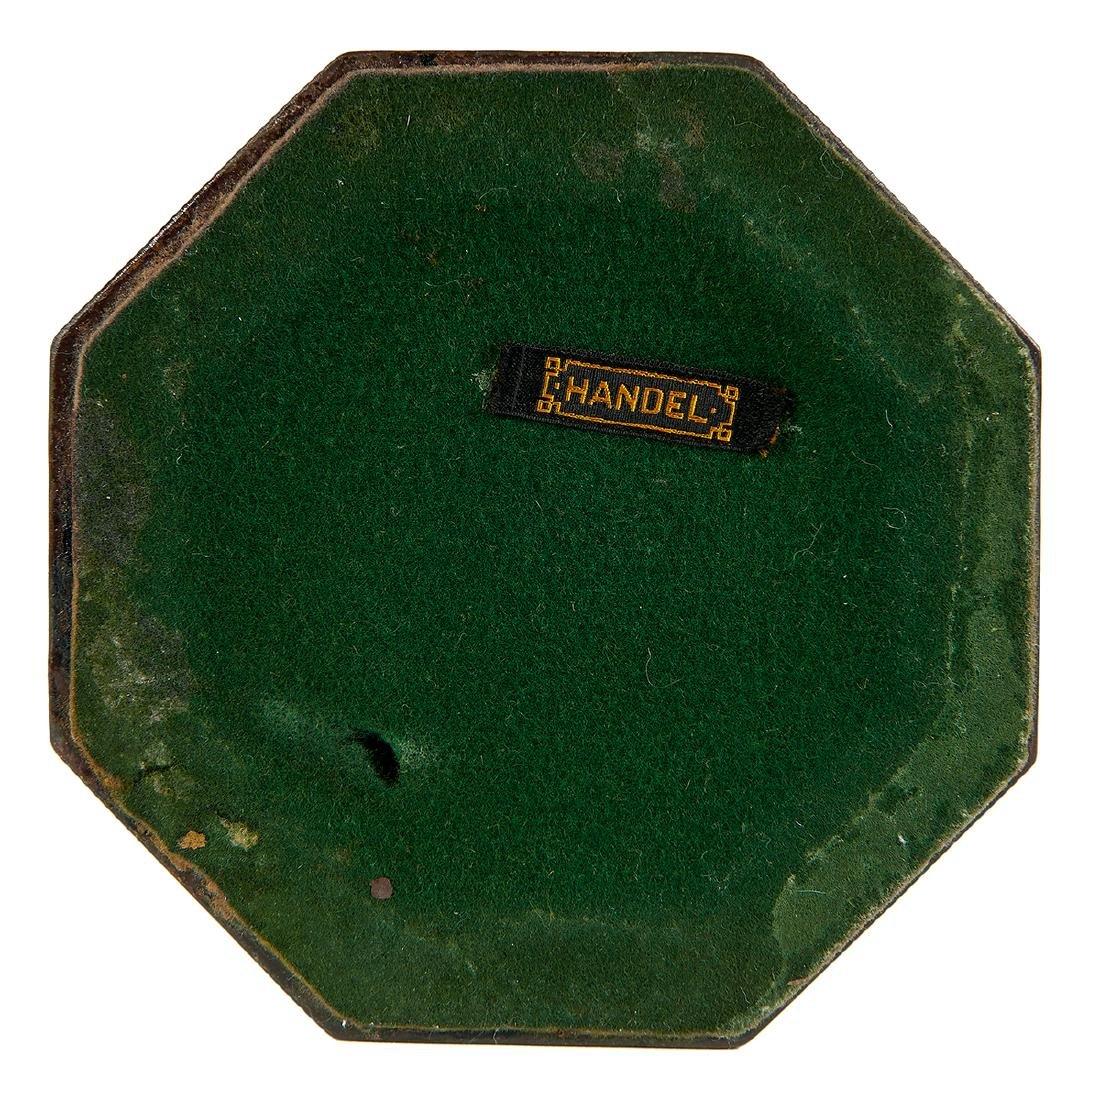 Handel, Obverse Painted Landscape Table Lamp - 4